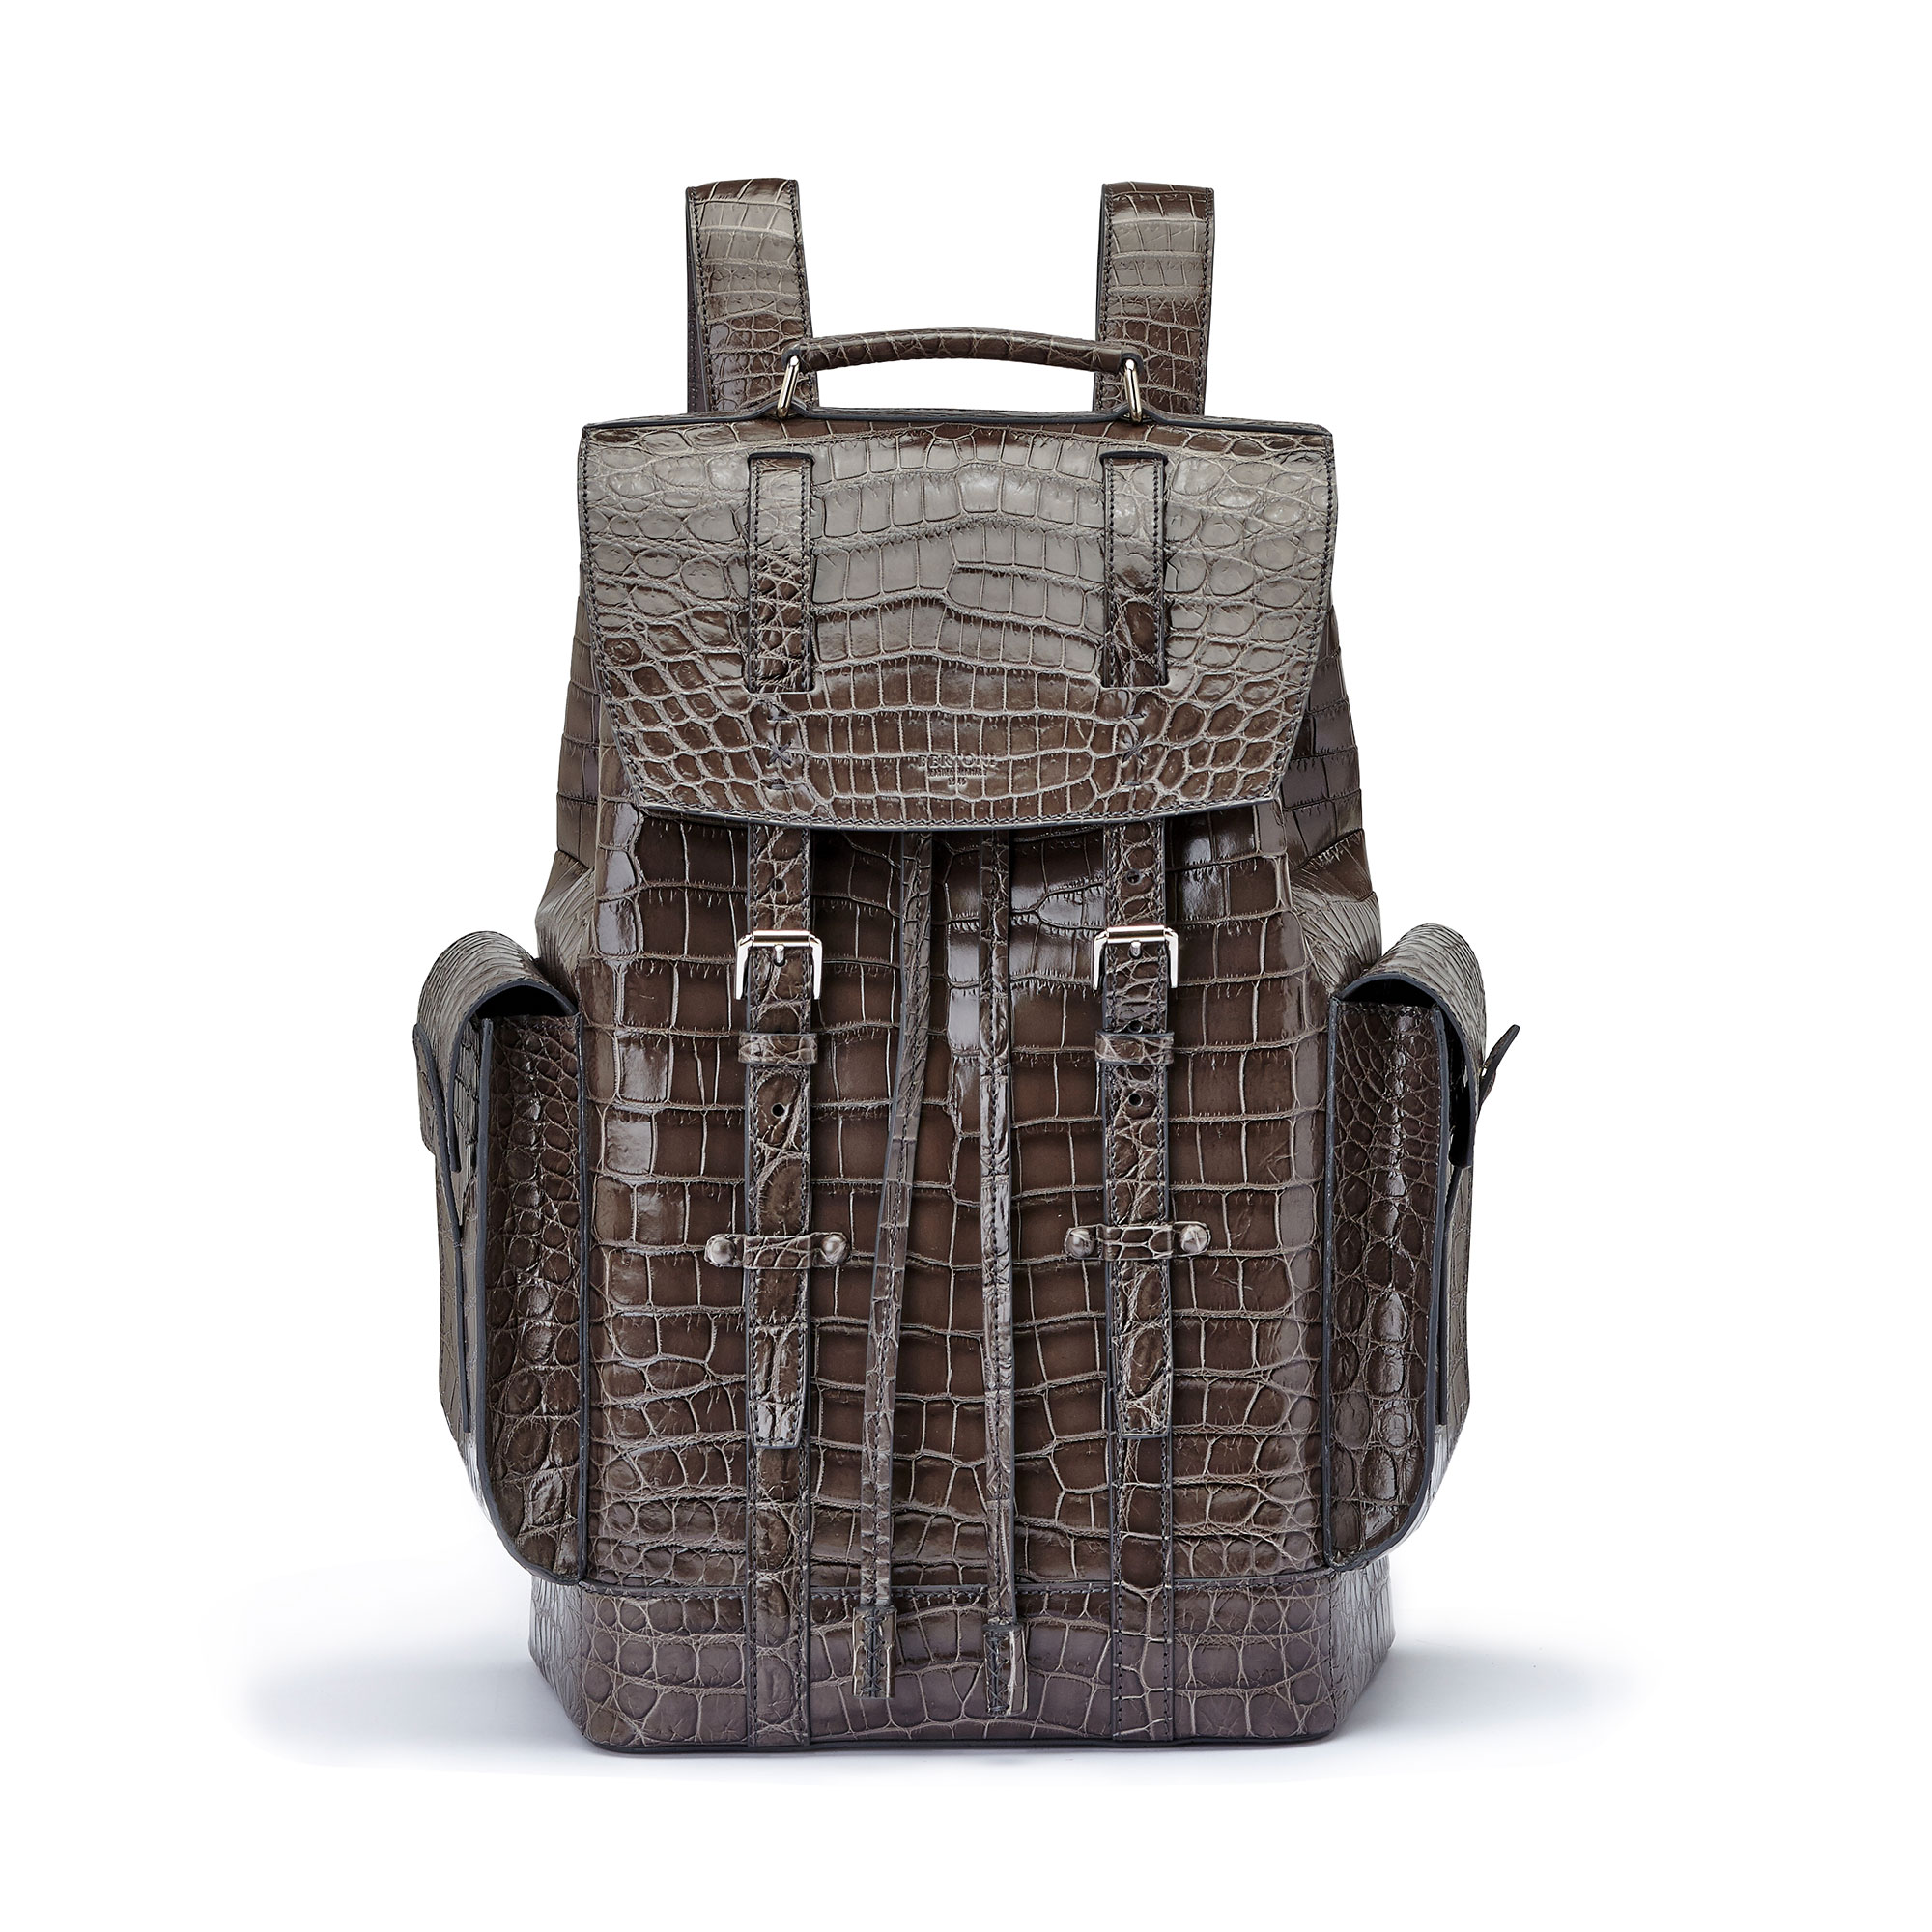 The grey alligator Traveller Backpack by Bertoni 1949 01